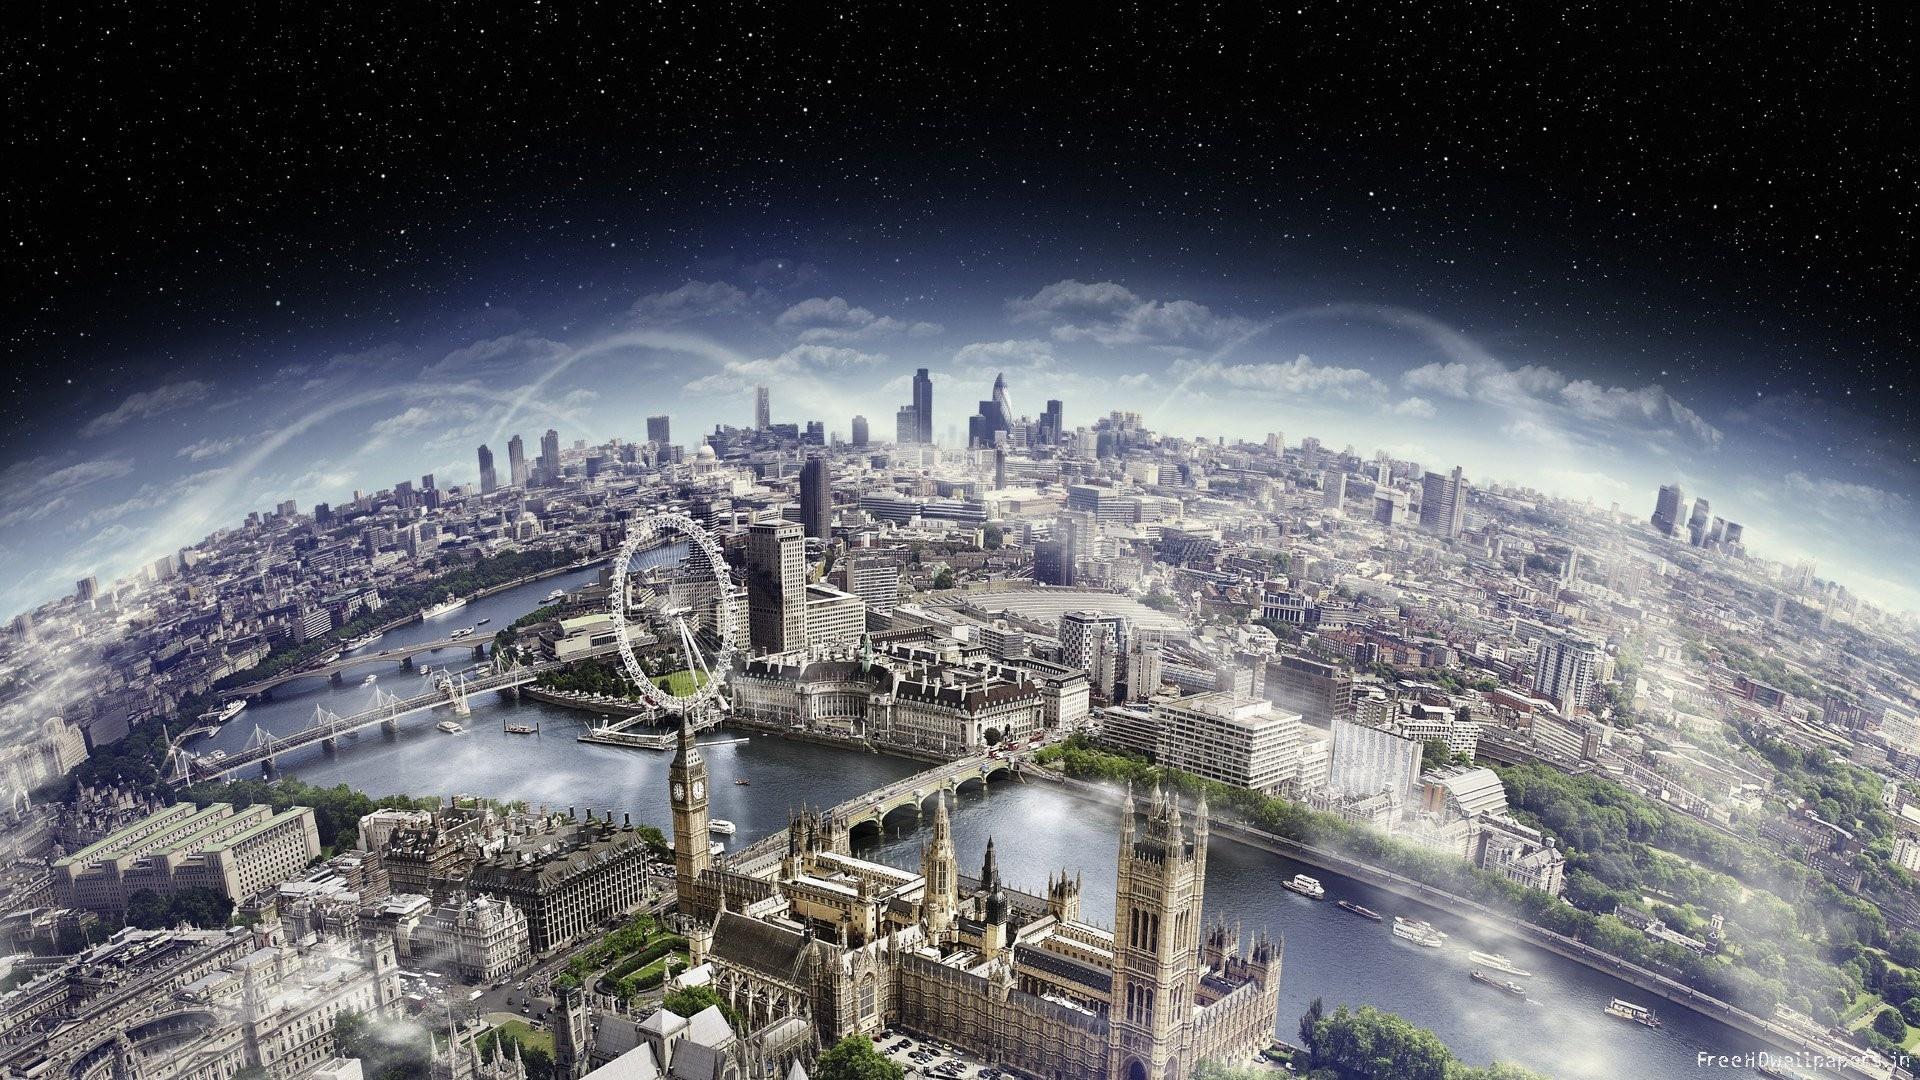 landscapes-horizon-london-ferris-1920x1080.jpg